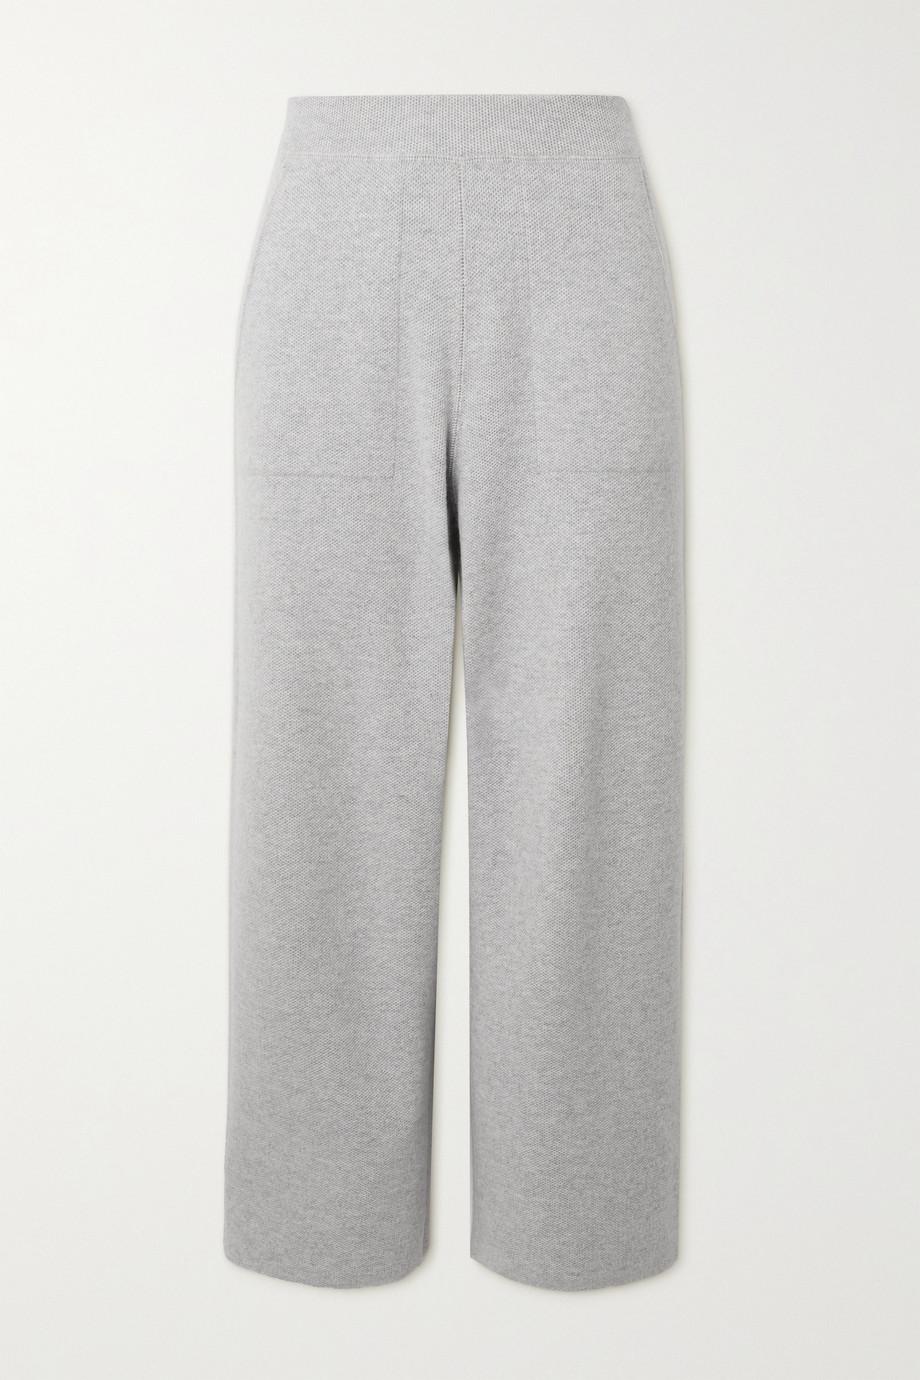 Akris Cropped cashmere track pants